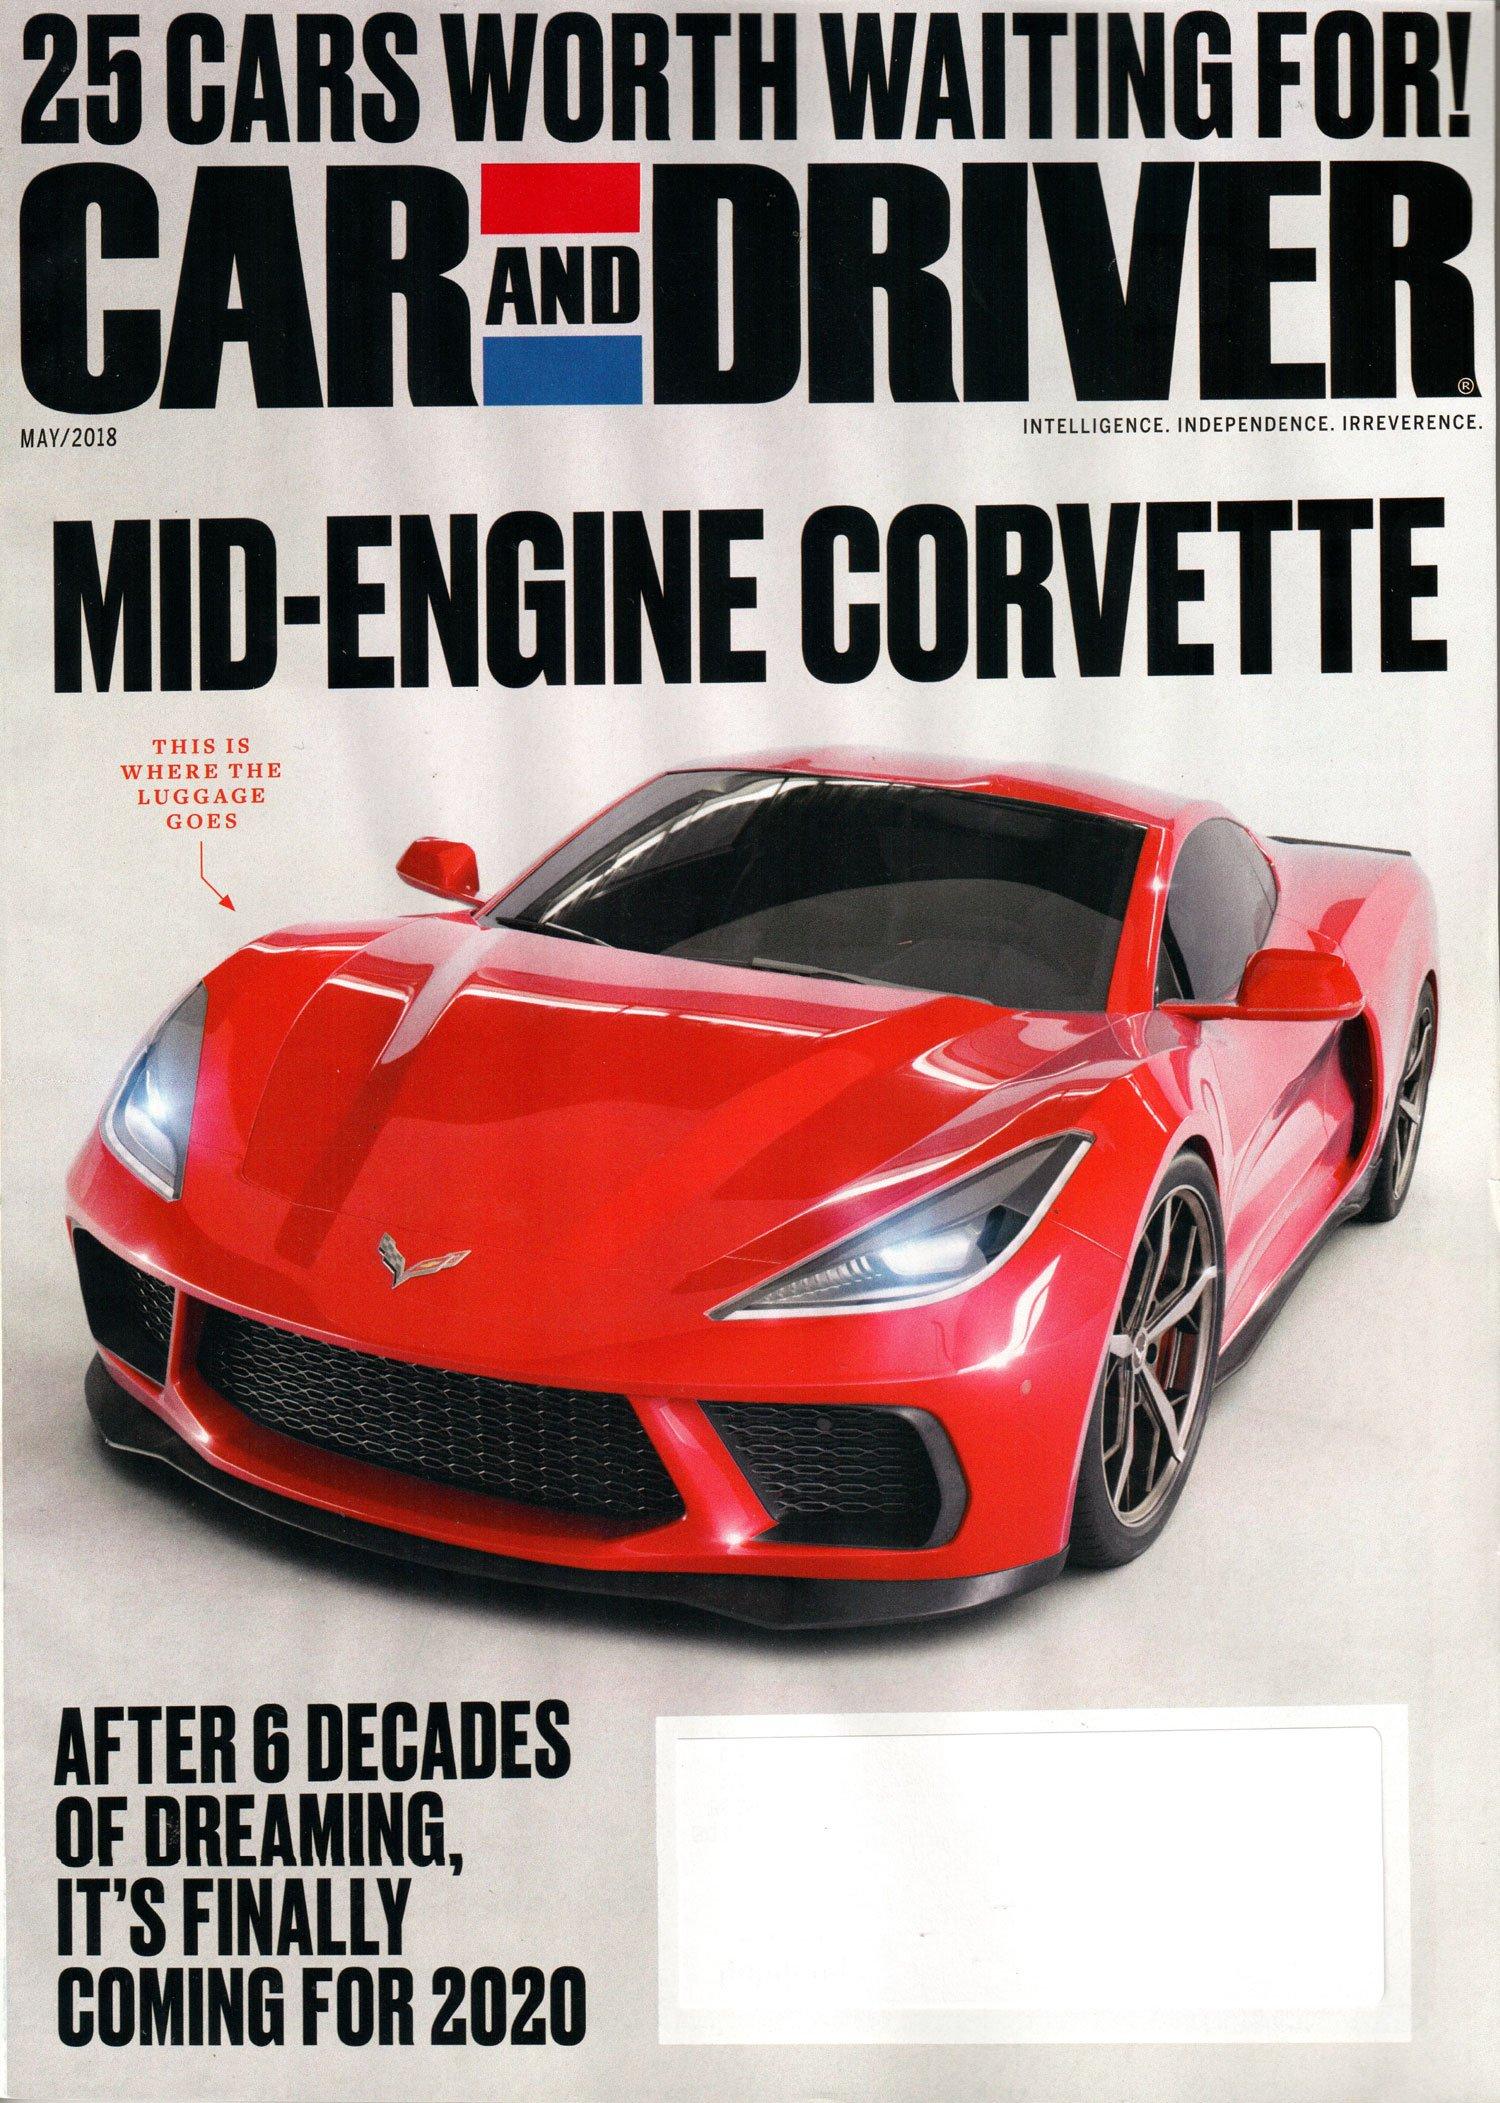 Free Car & Driver Magazine Subscription